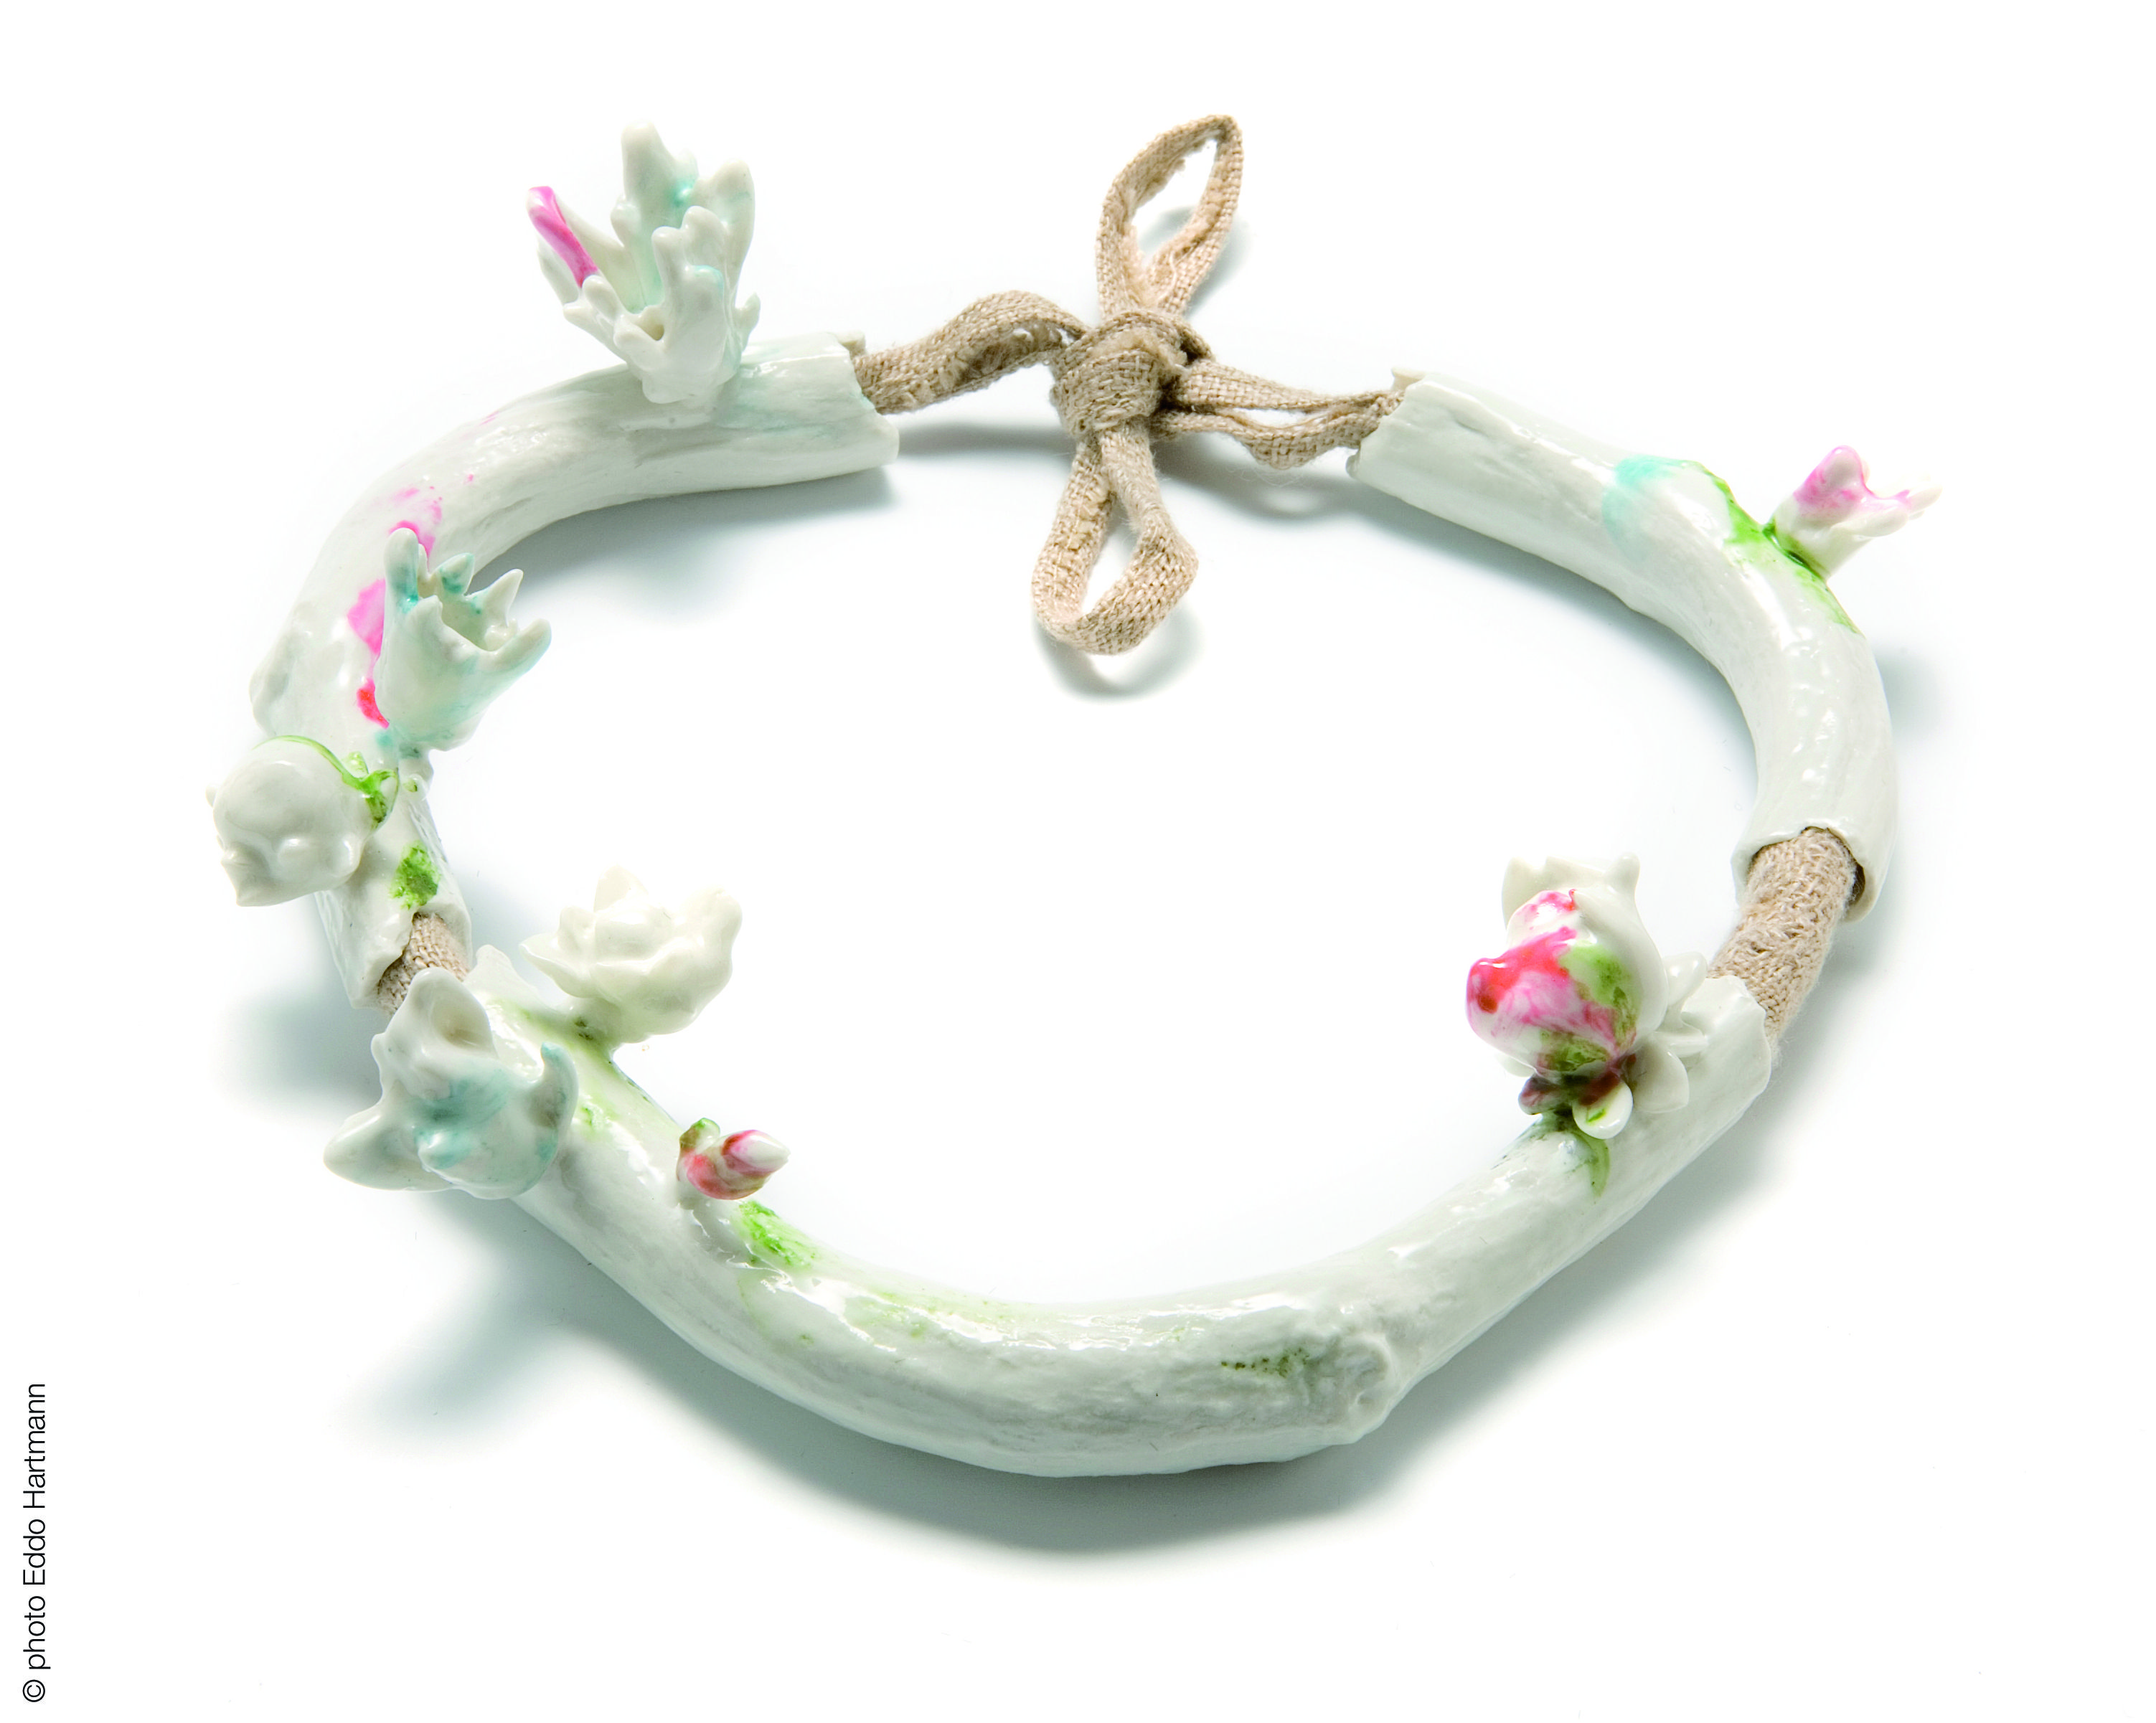 Rococo - Evert Nijland  2009 collier | porcelaine, lin  necklace | porcelain, linen ø 16cm Copyright Heddo Hartmann